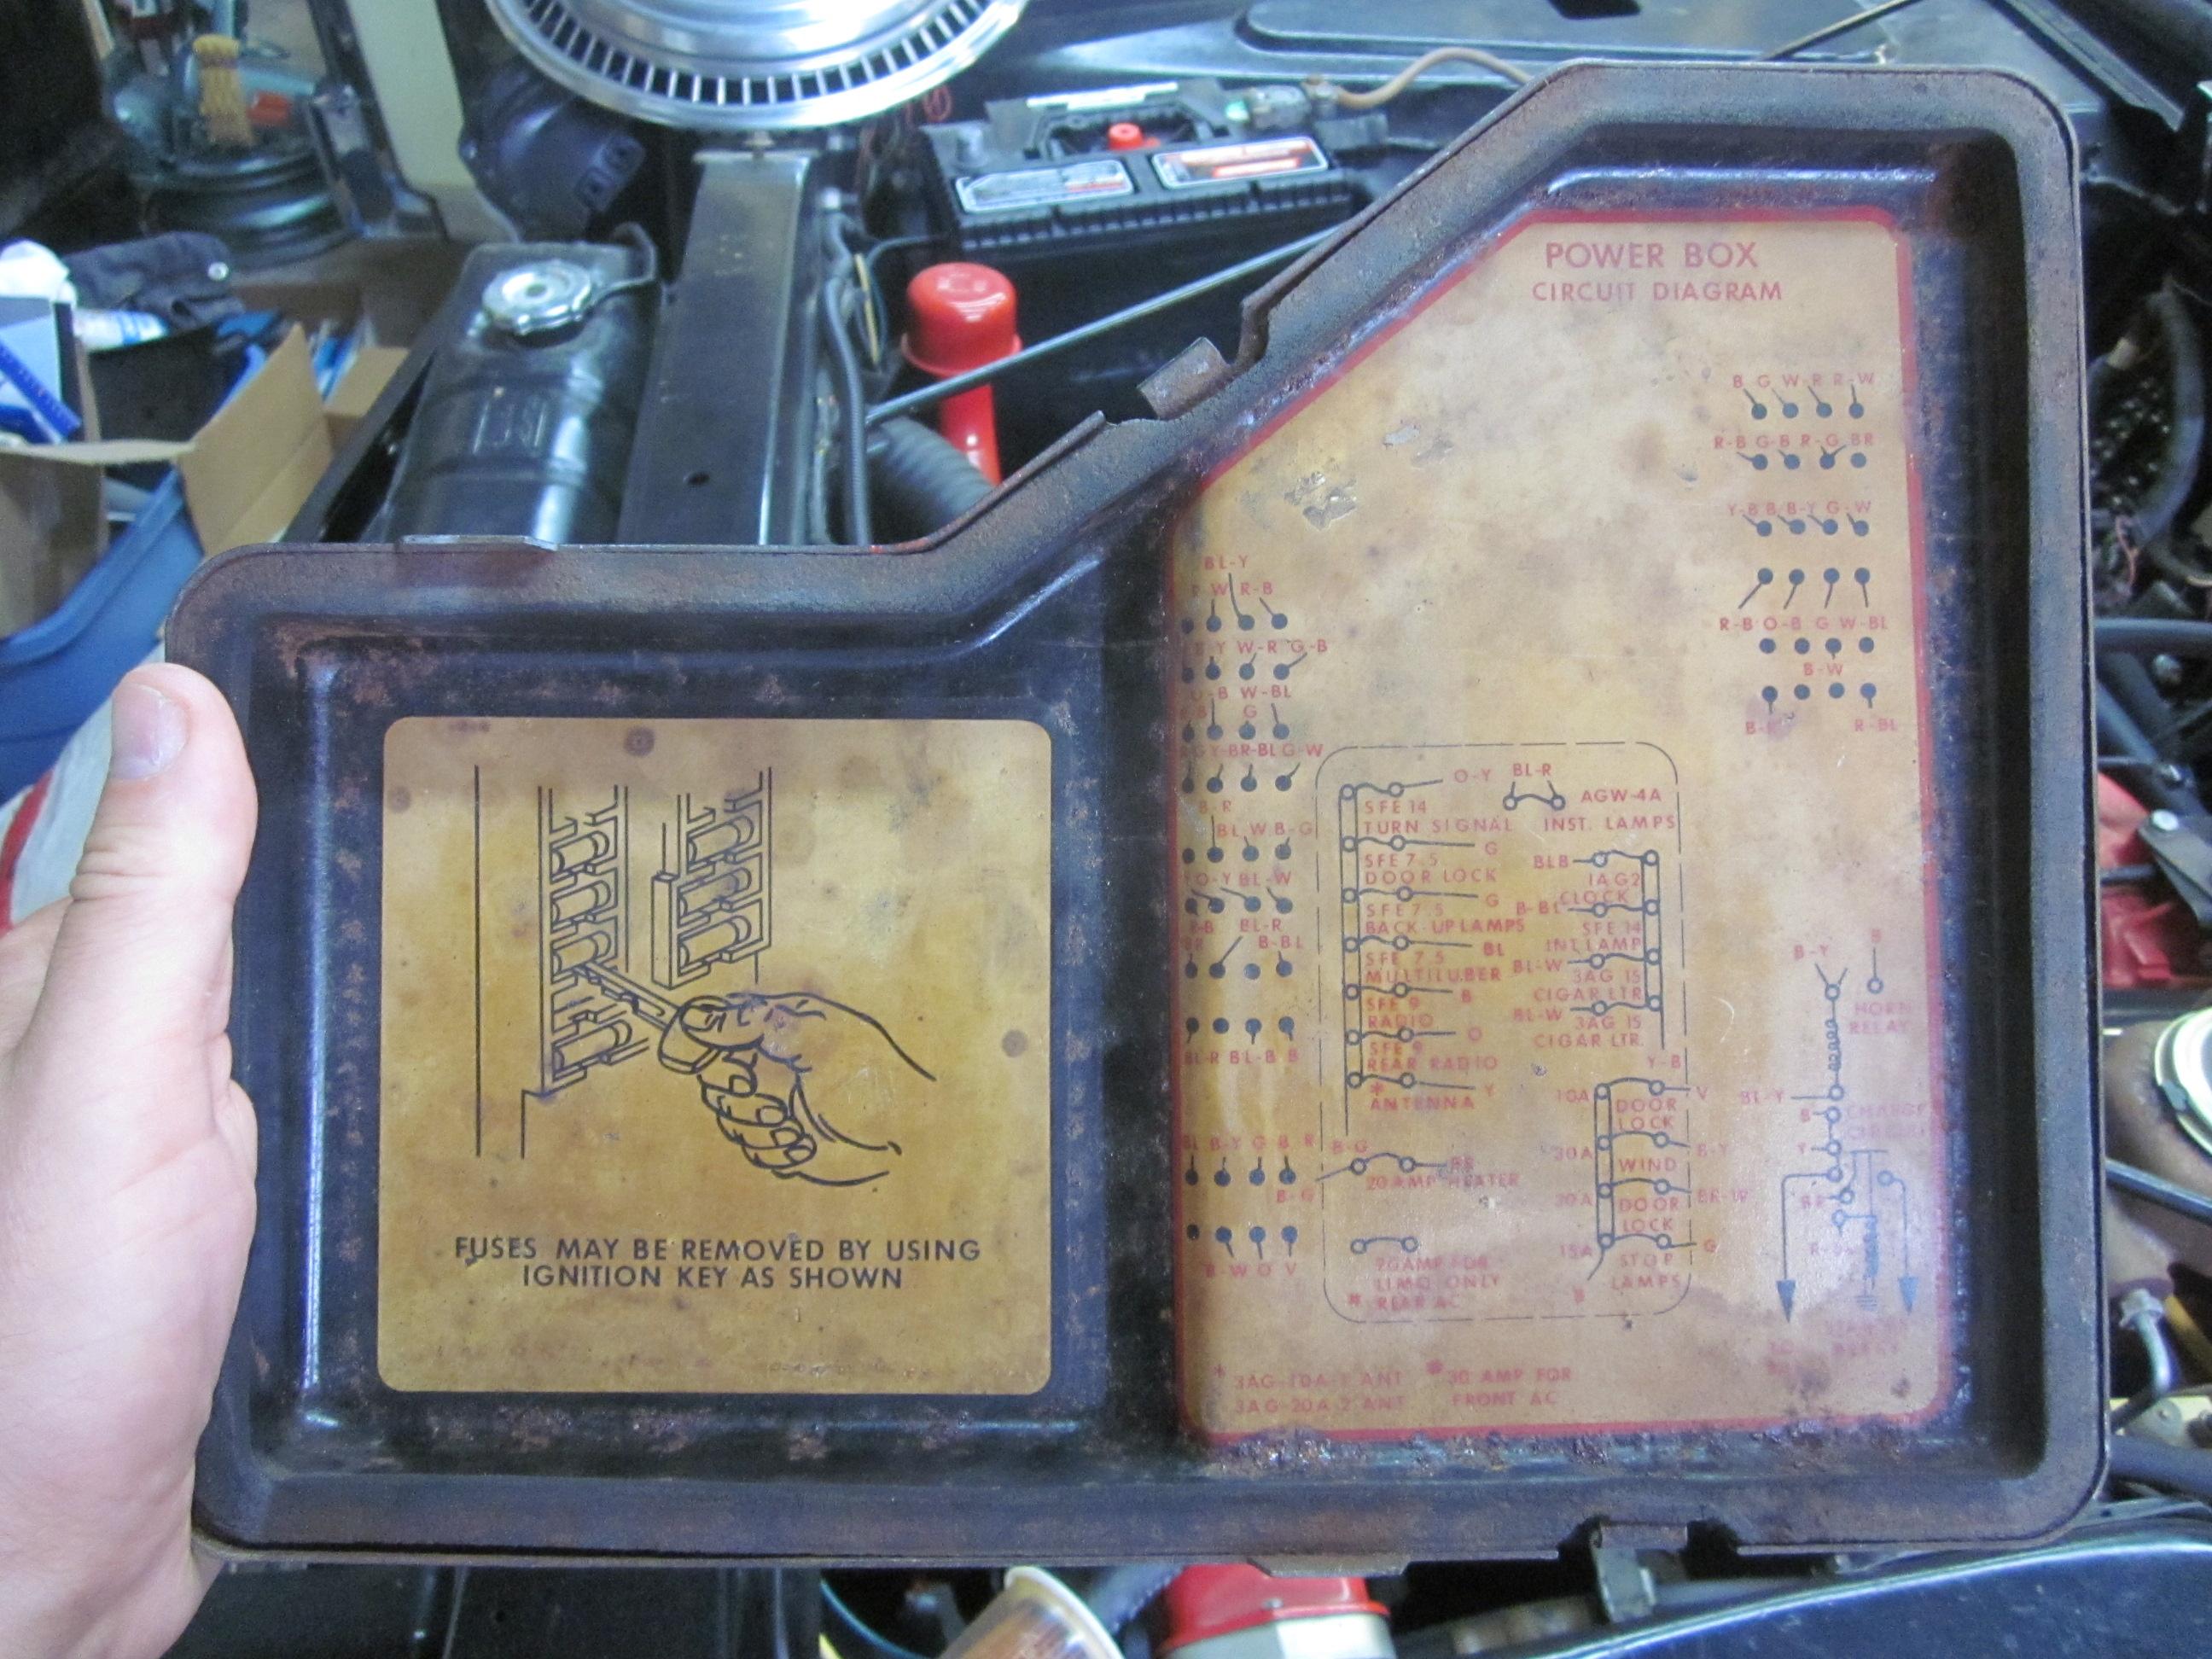 medium resolution of 1968 corvette fuse box wiring diagram1969 corvette fuse box location wiring diagram database1969 corvette fuse box